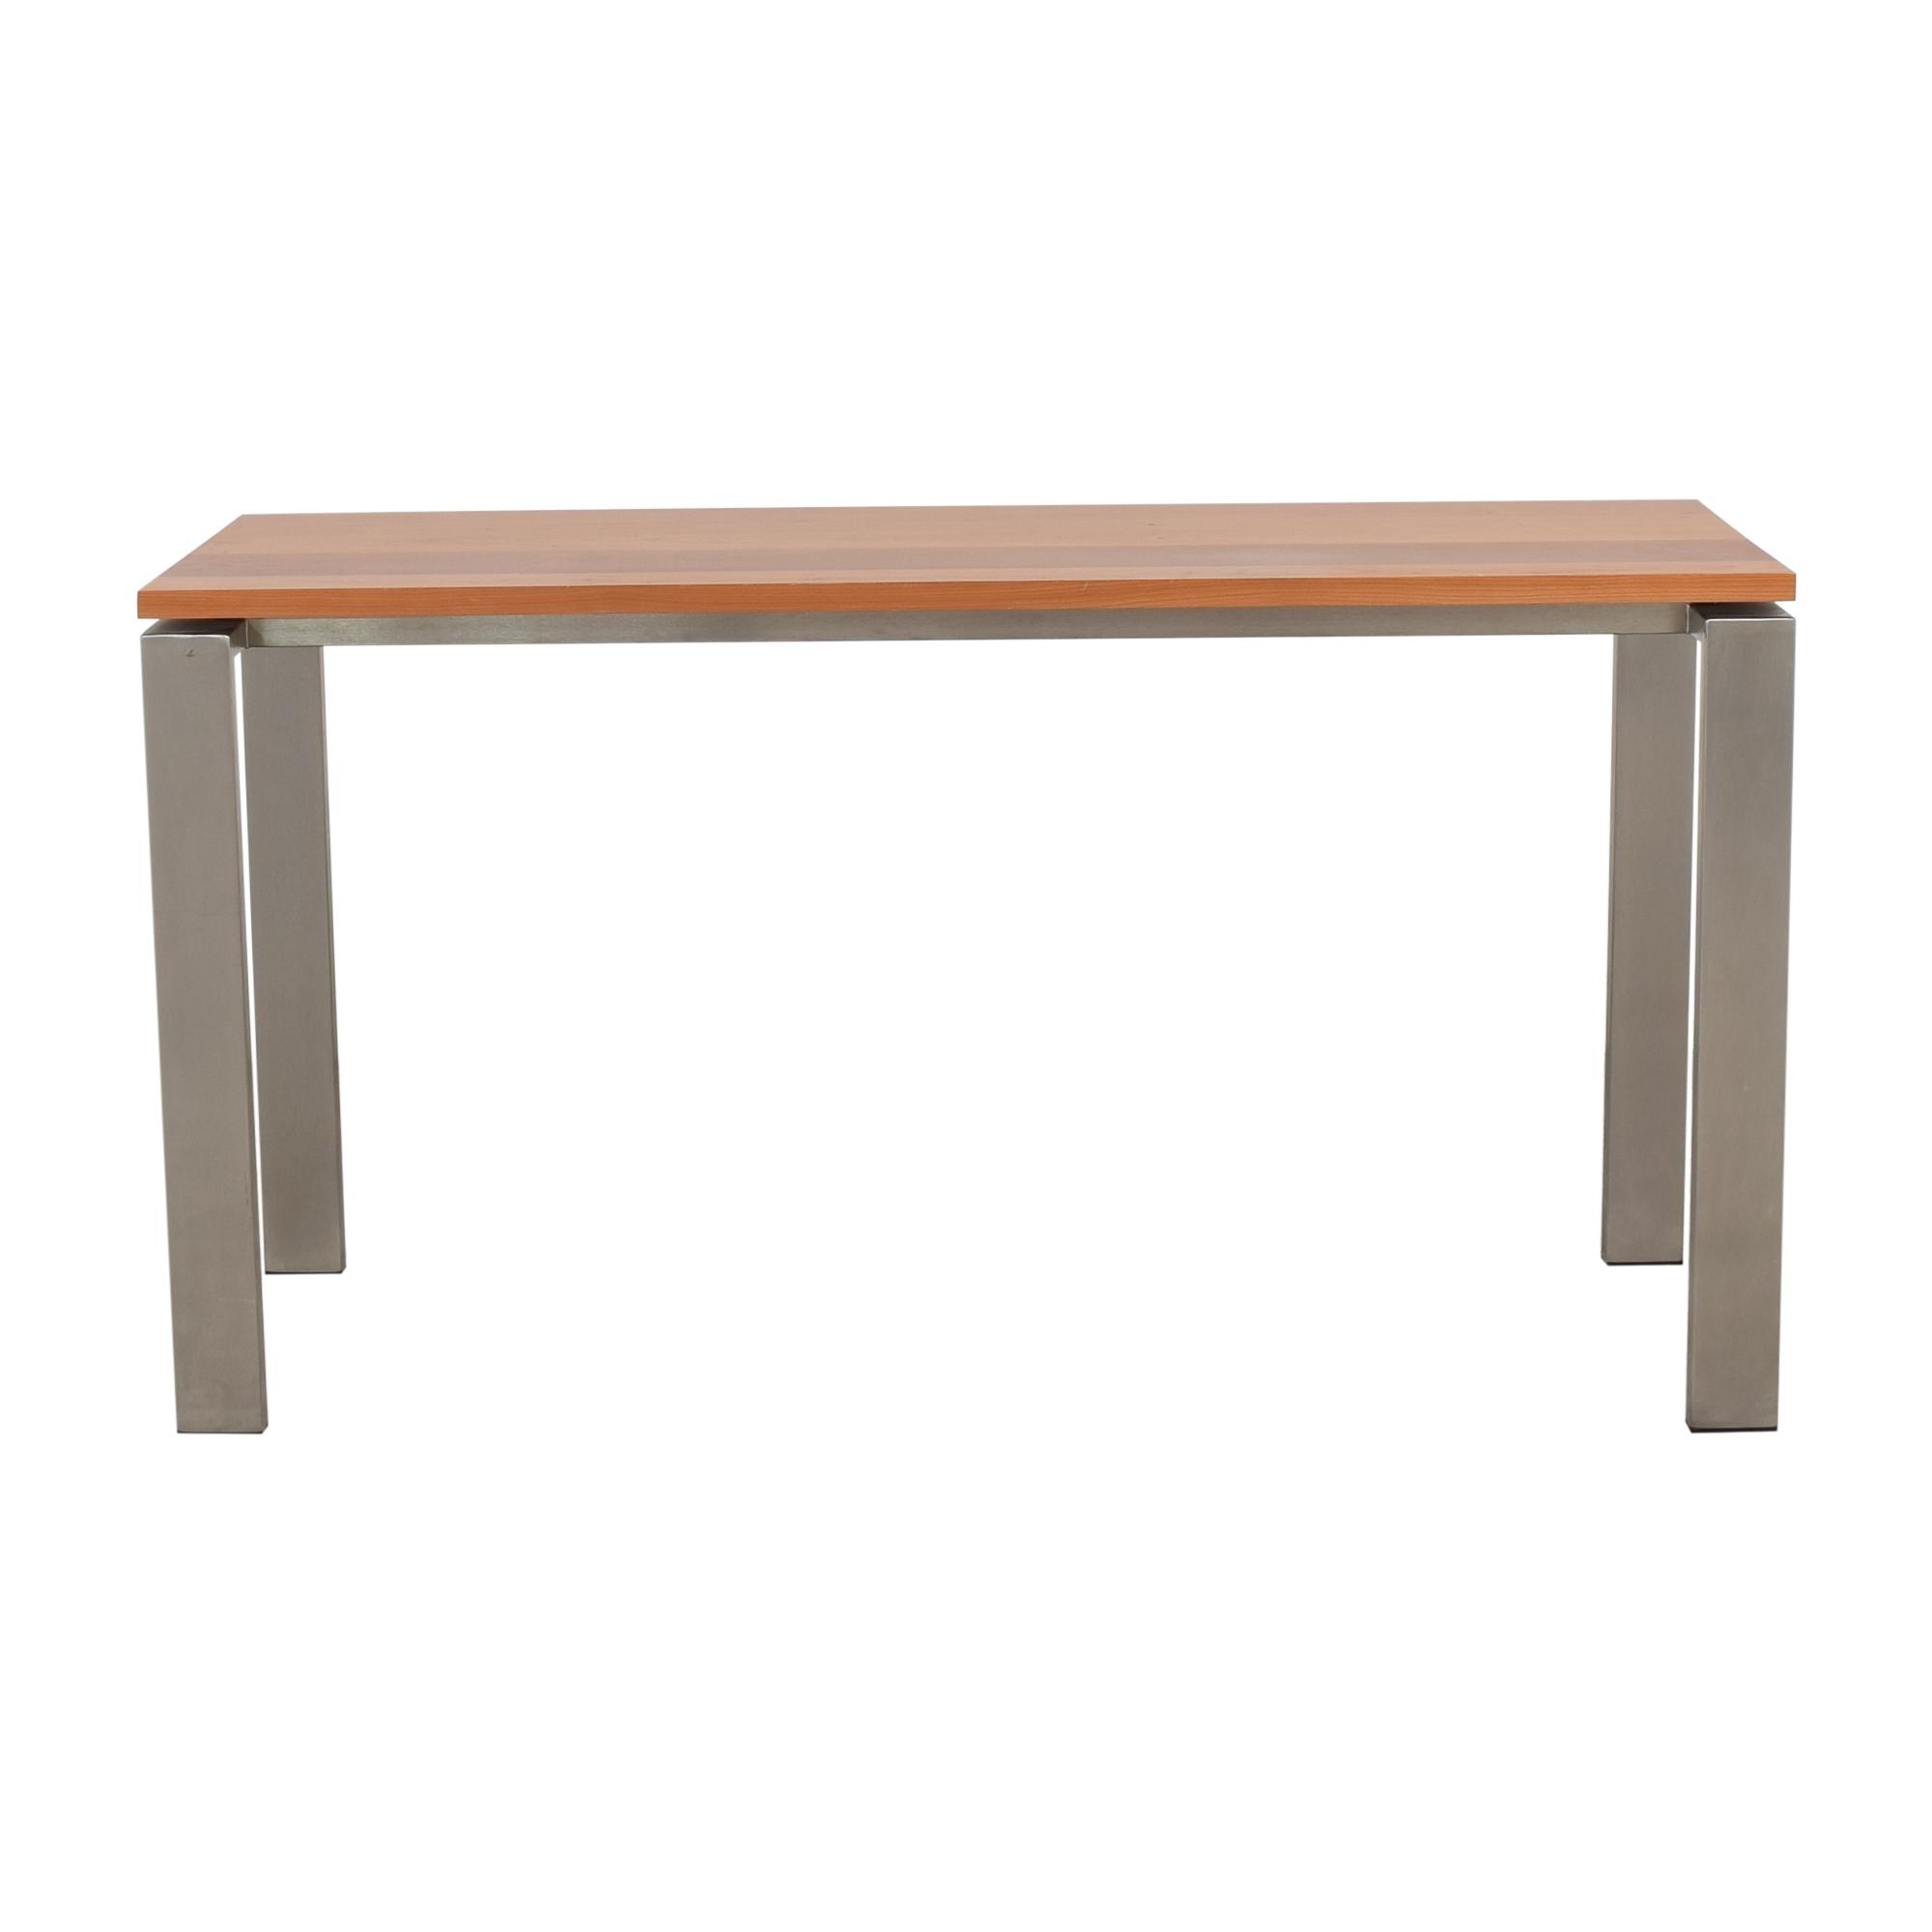 Room & Board Room & Board Rand Desk in Stainless Steel Home Office Desks